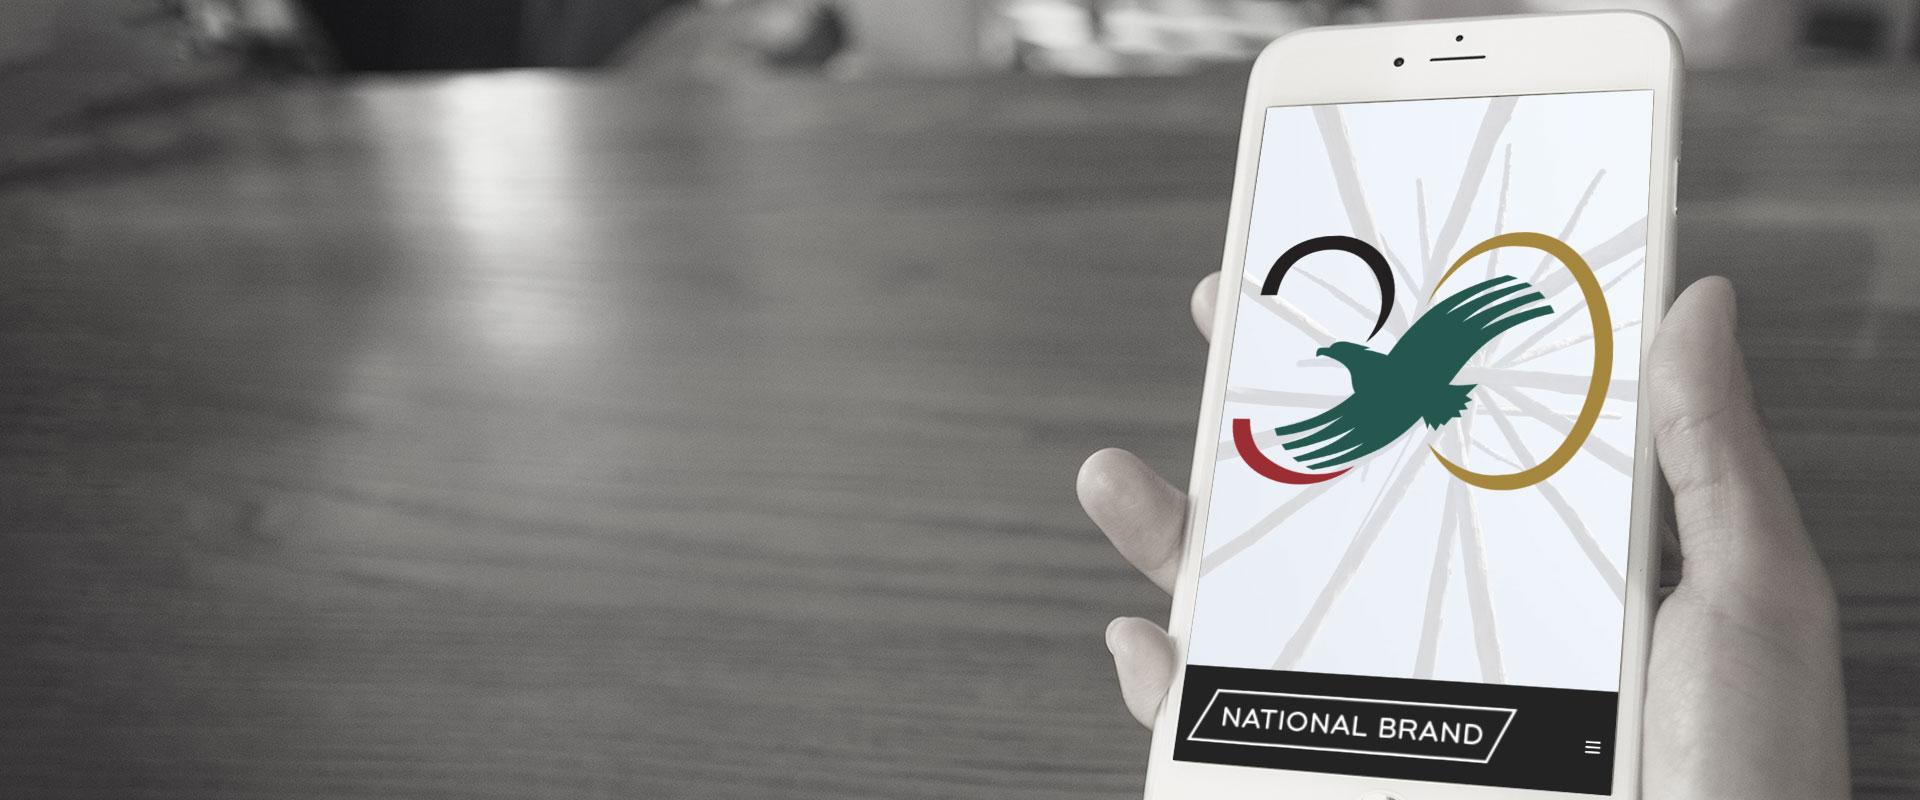 national brand communications